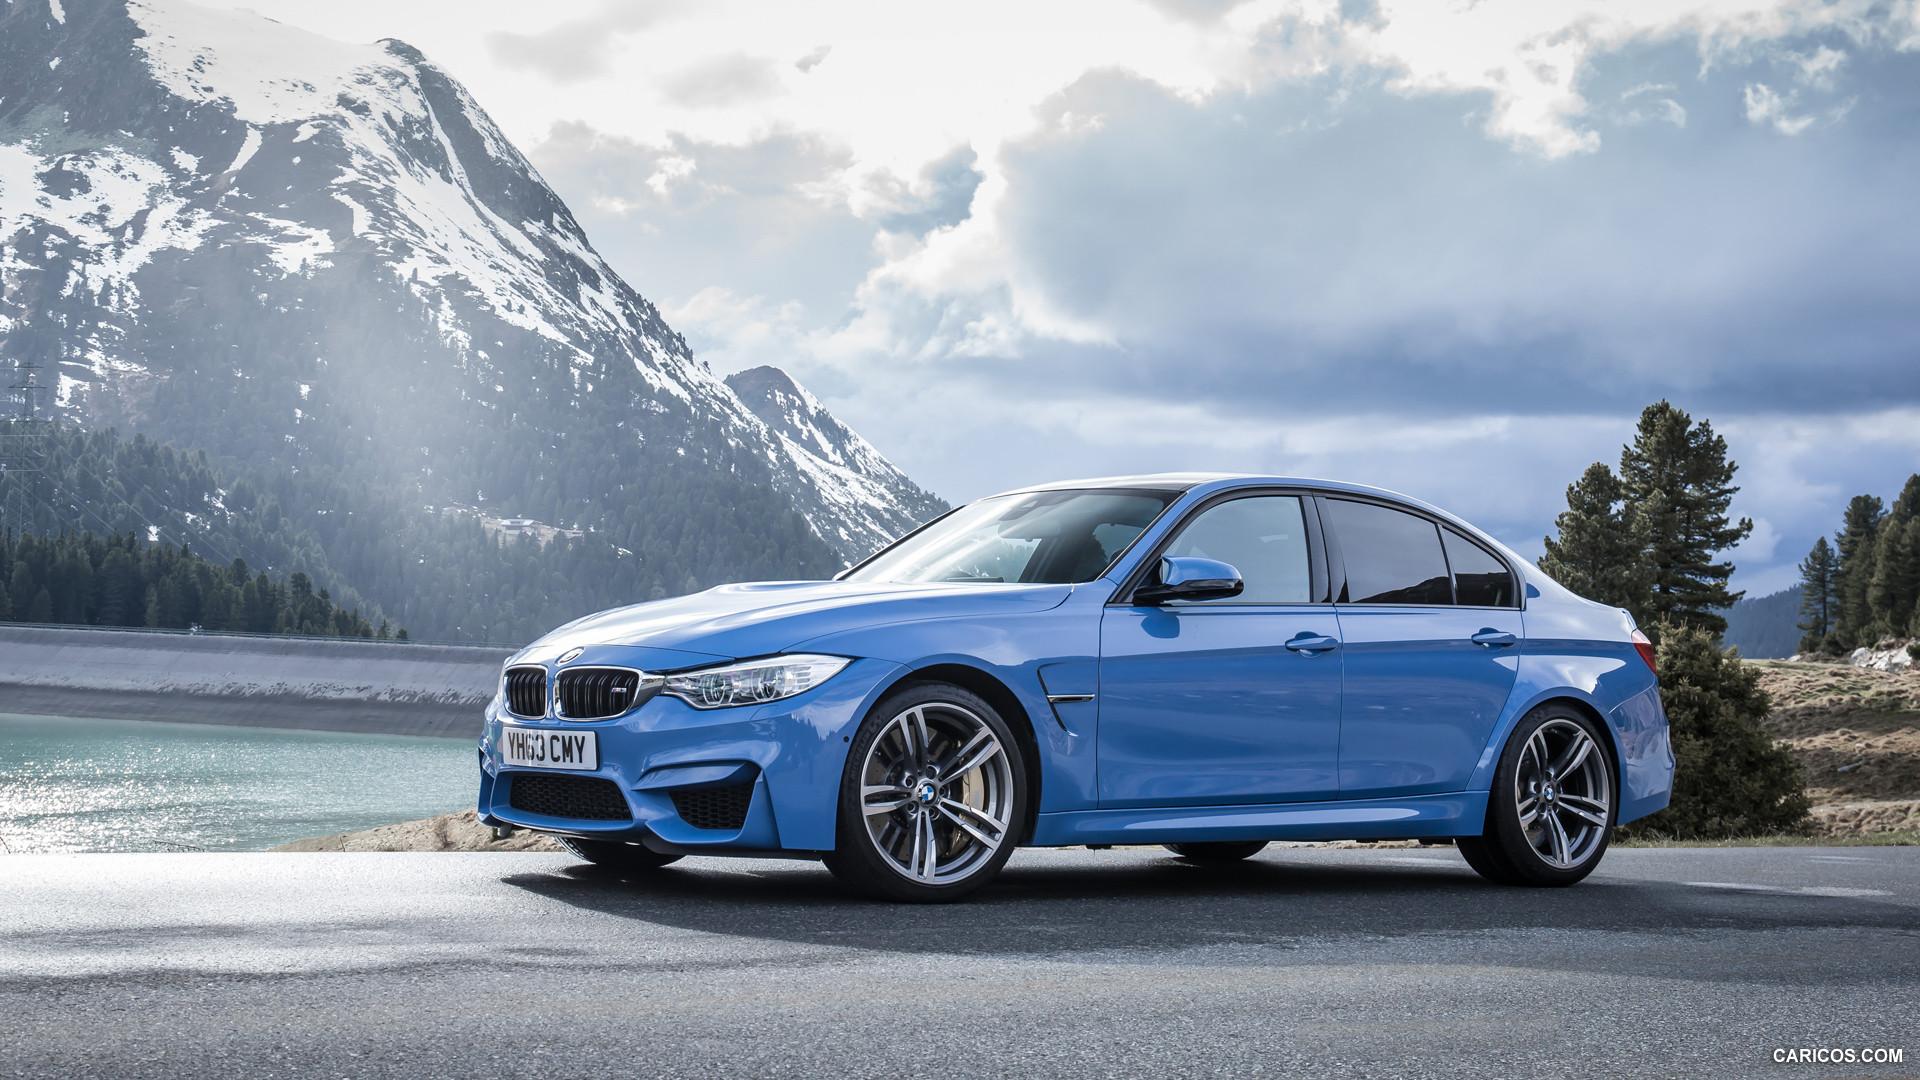 2015 BMW M3 Full HD Wallpapers 18346   Grivucom 1920x1080